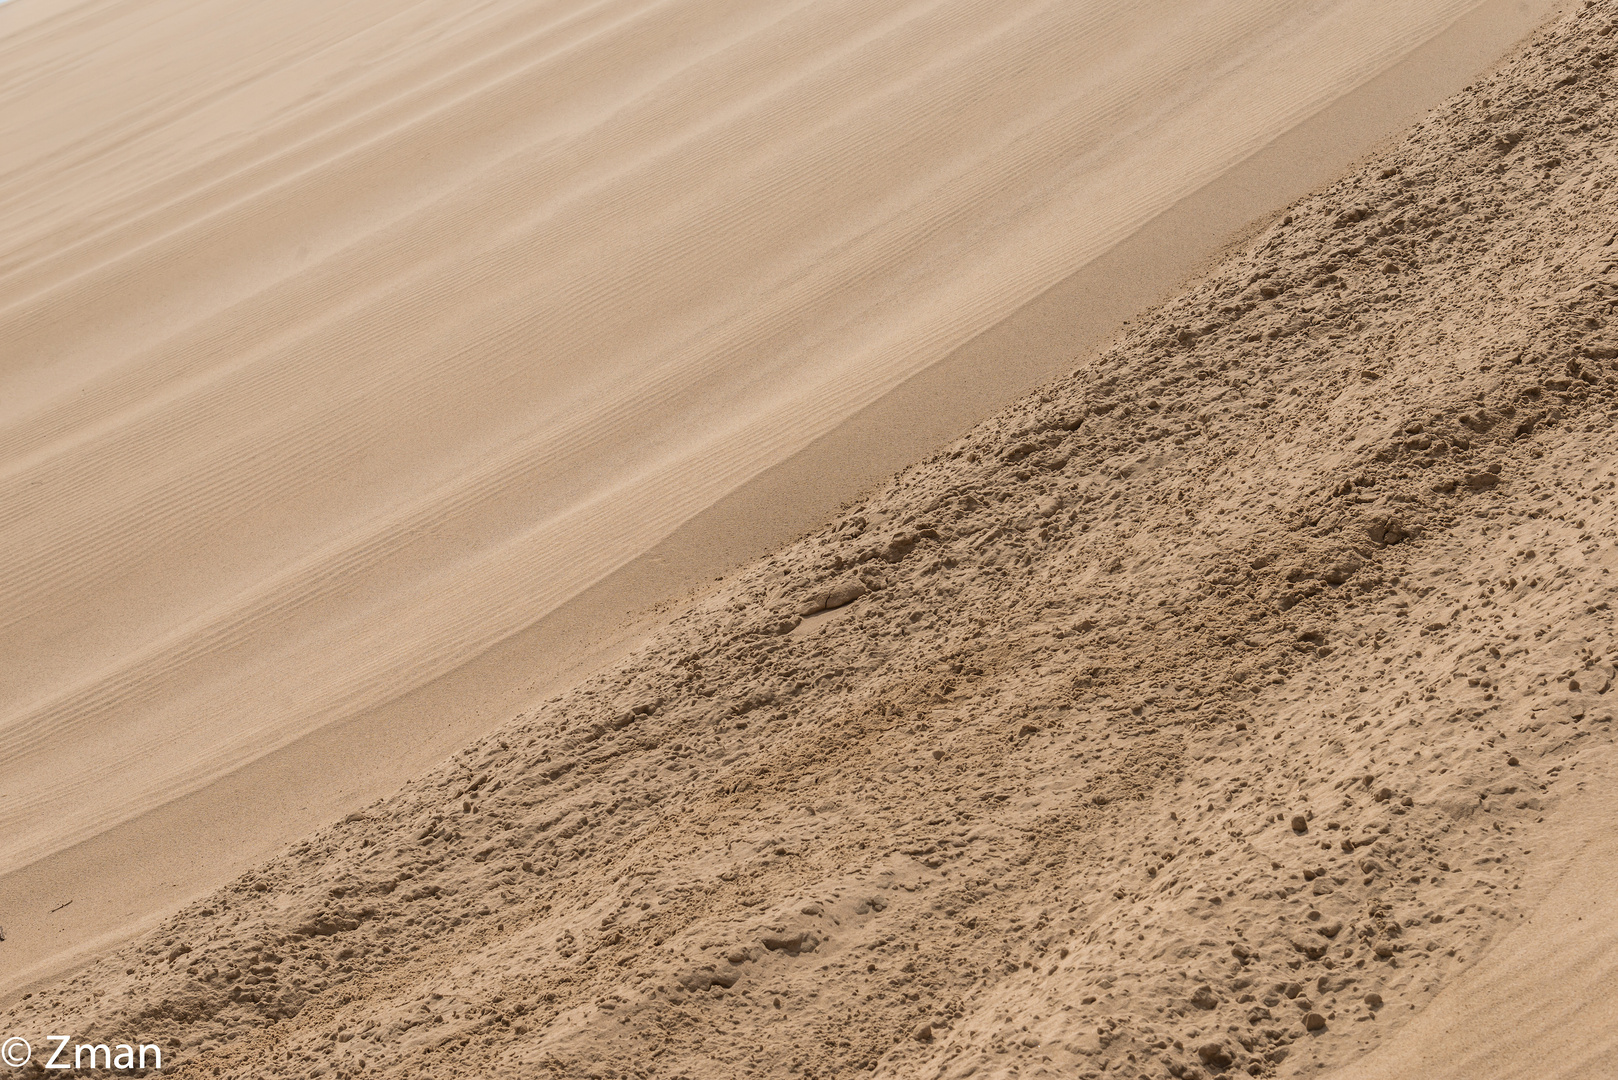 Namibia Wilderness 10